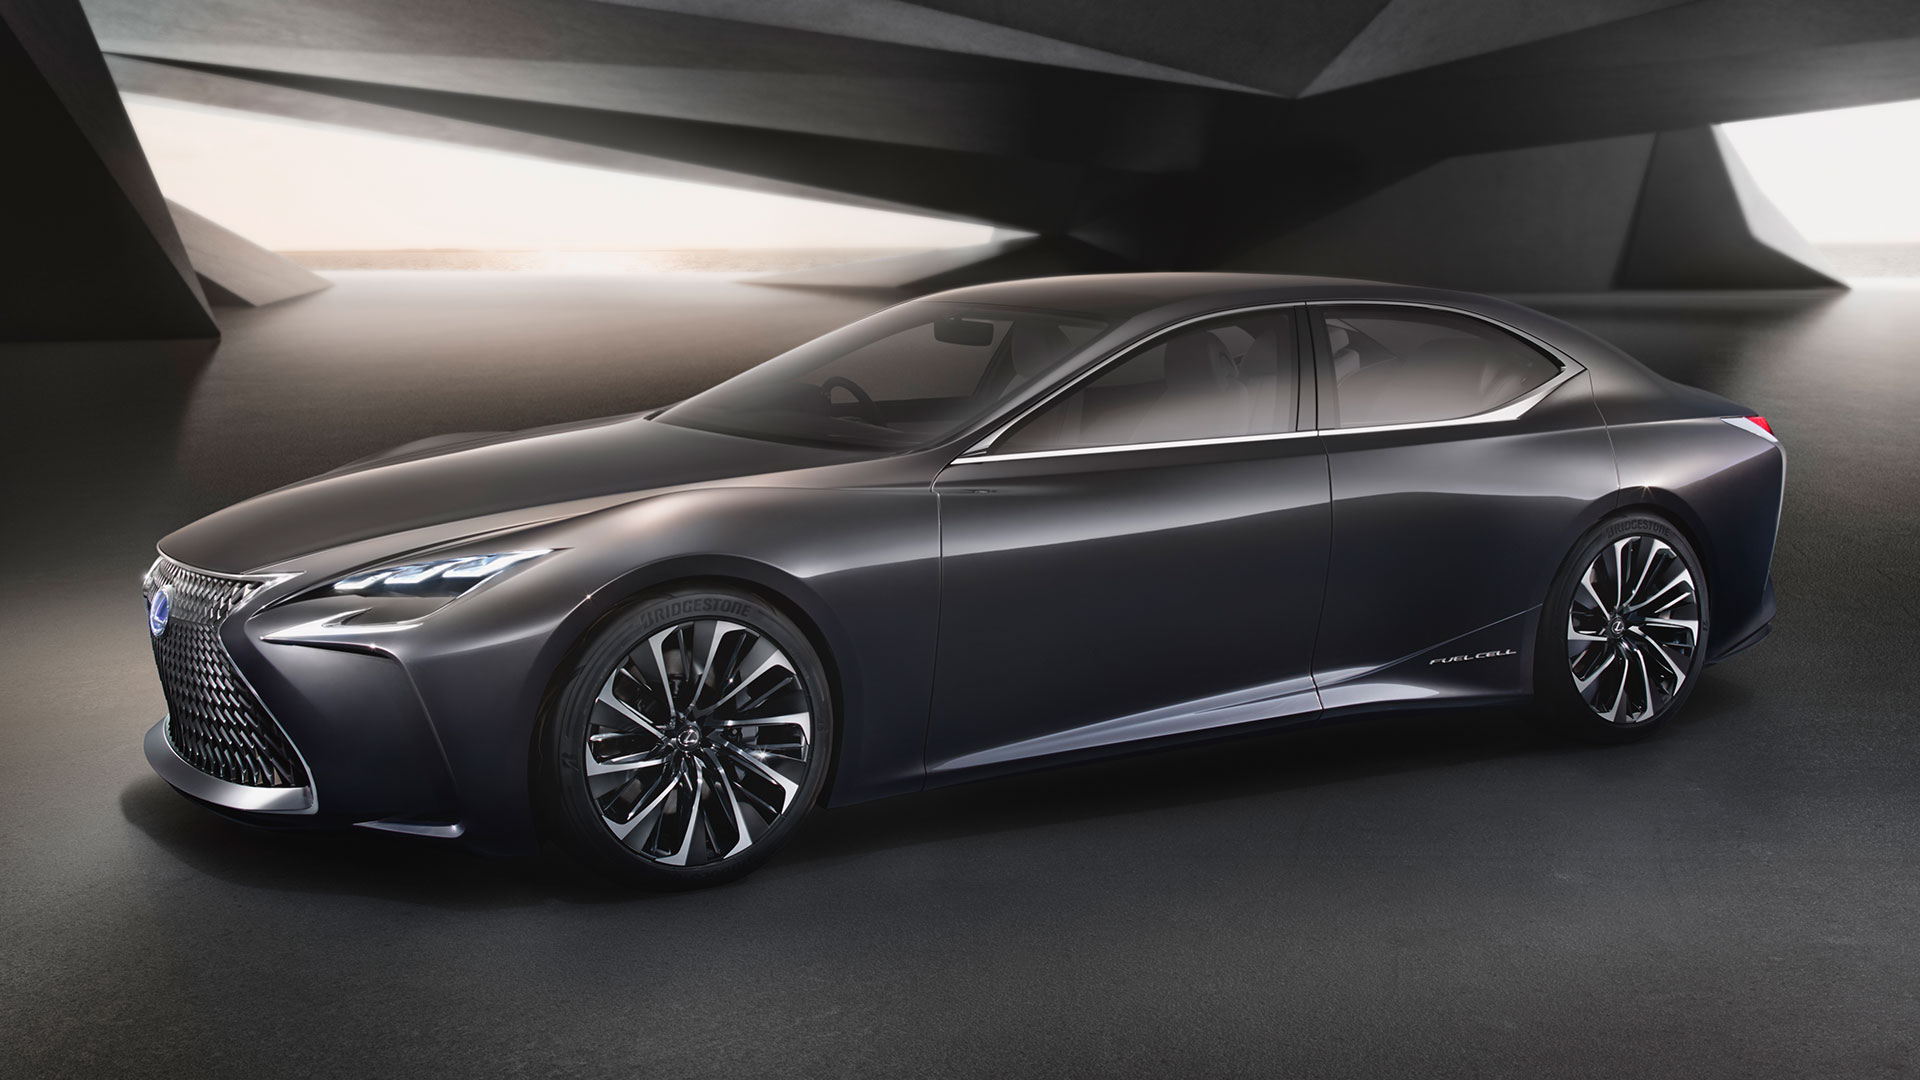 2020 Lexus Lf Lc Speed Test